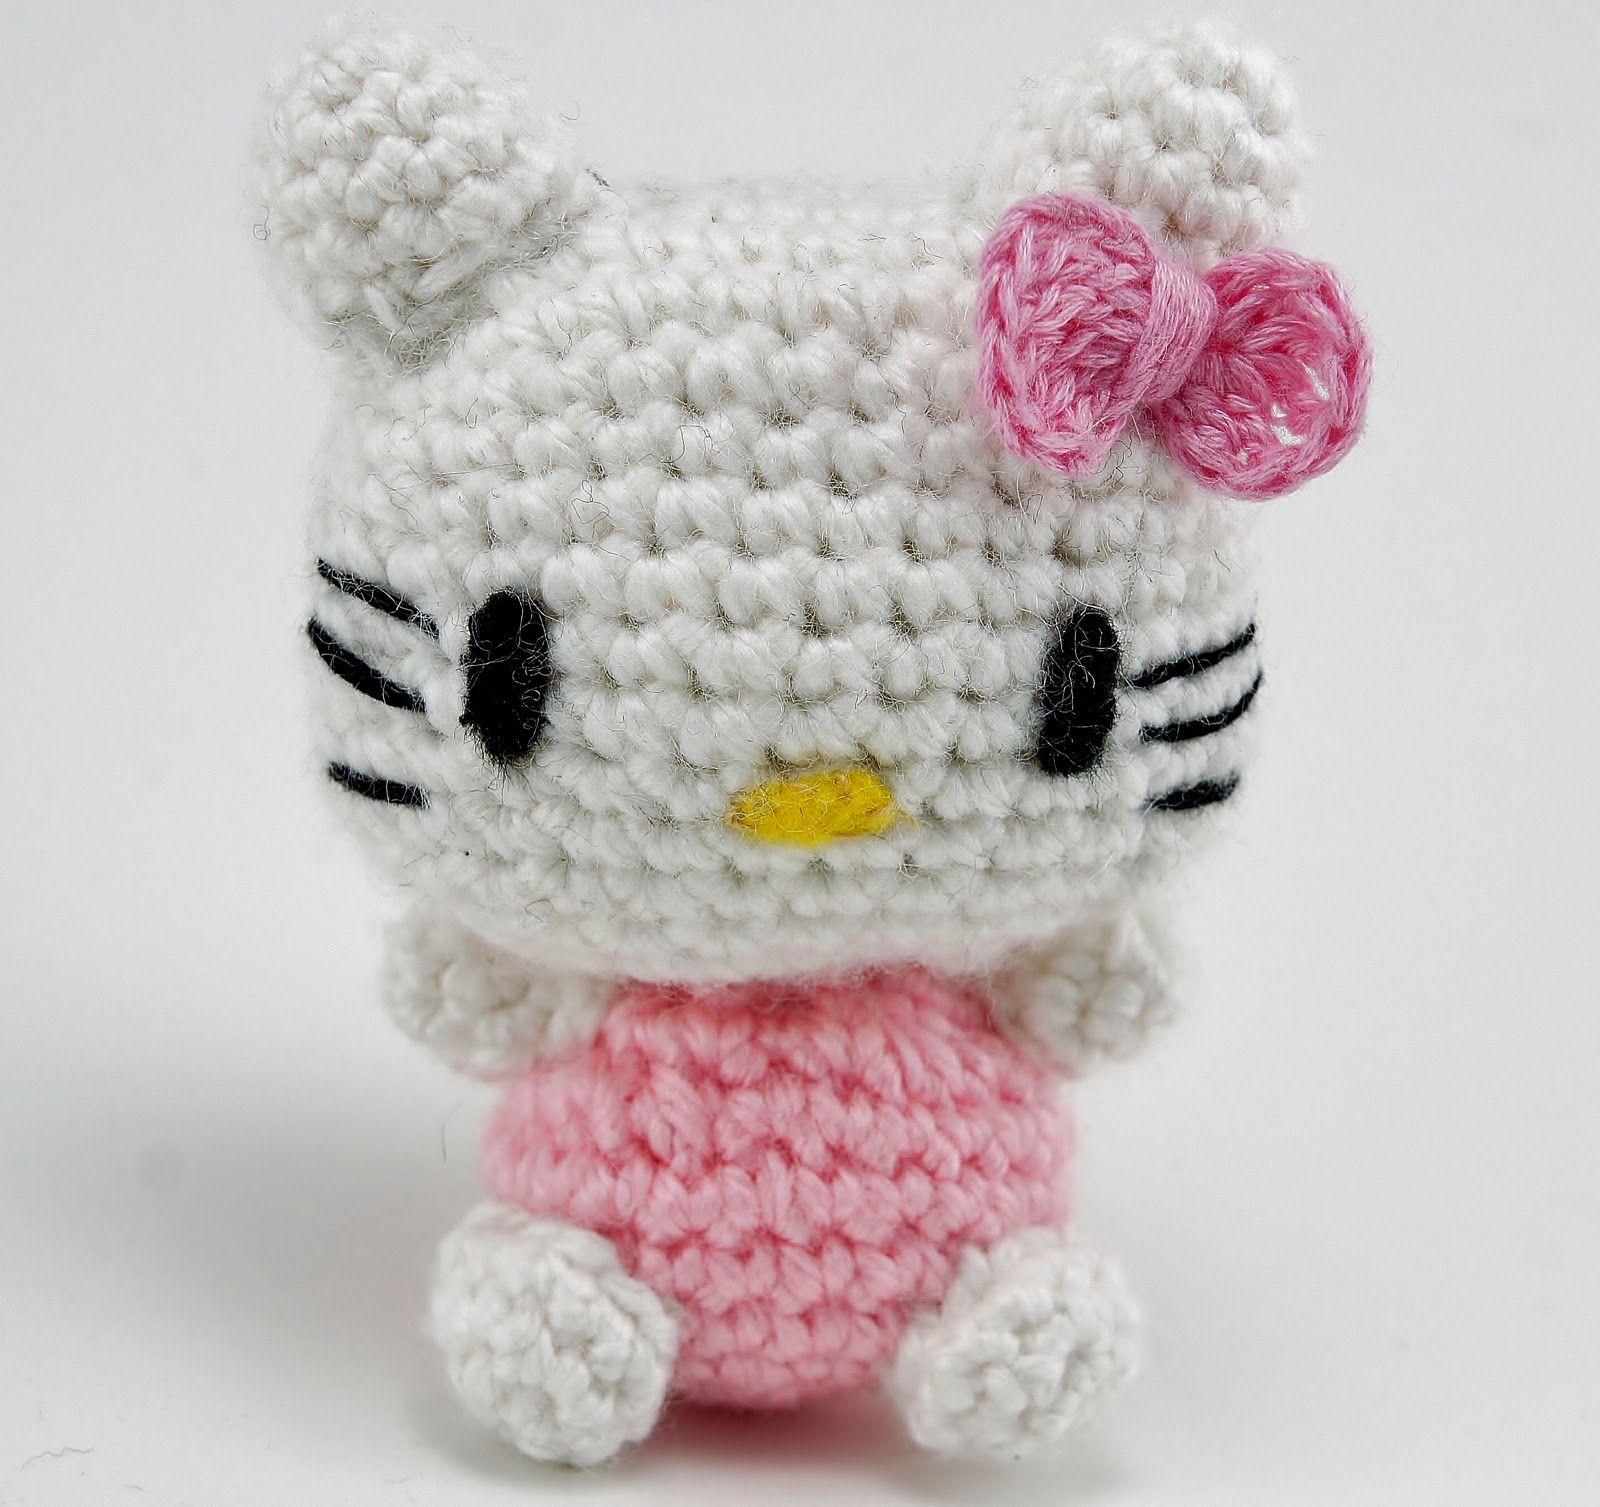 crochet thread amigurumi | Hello Kitty amigurumi for a friend